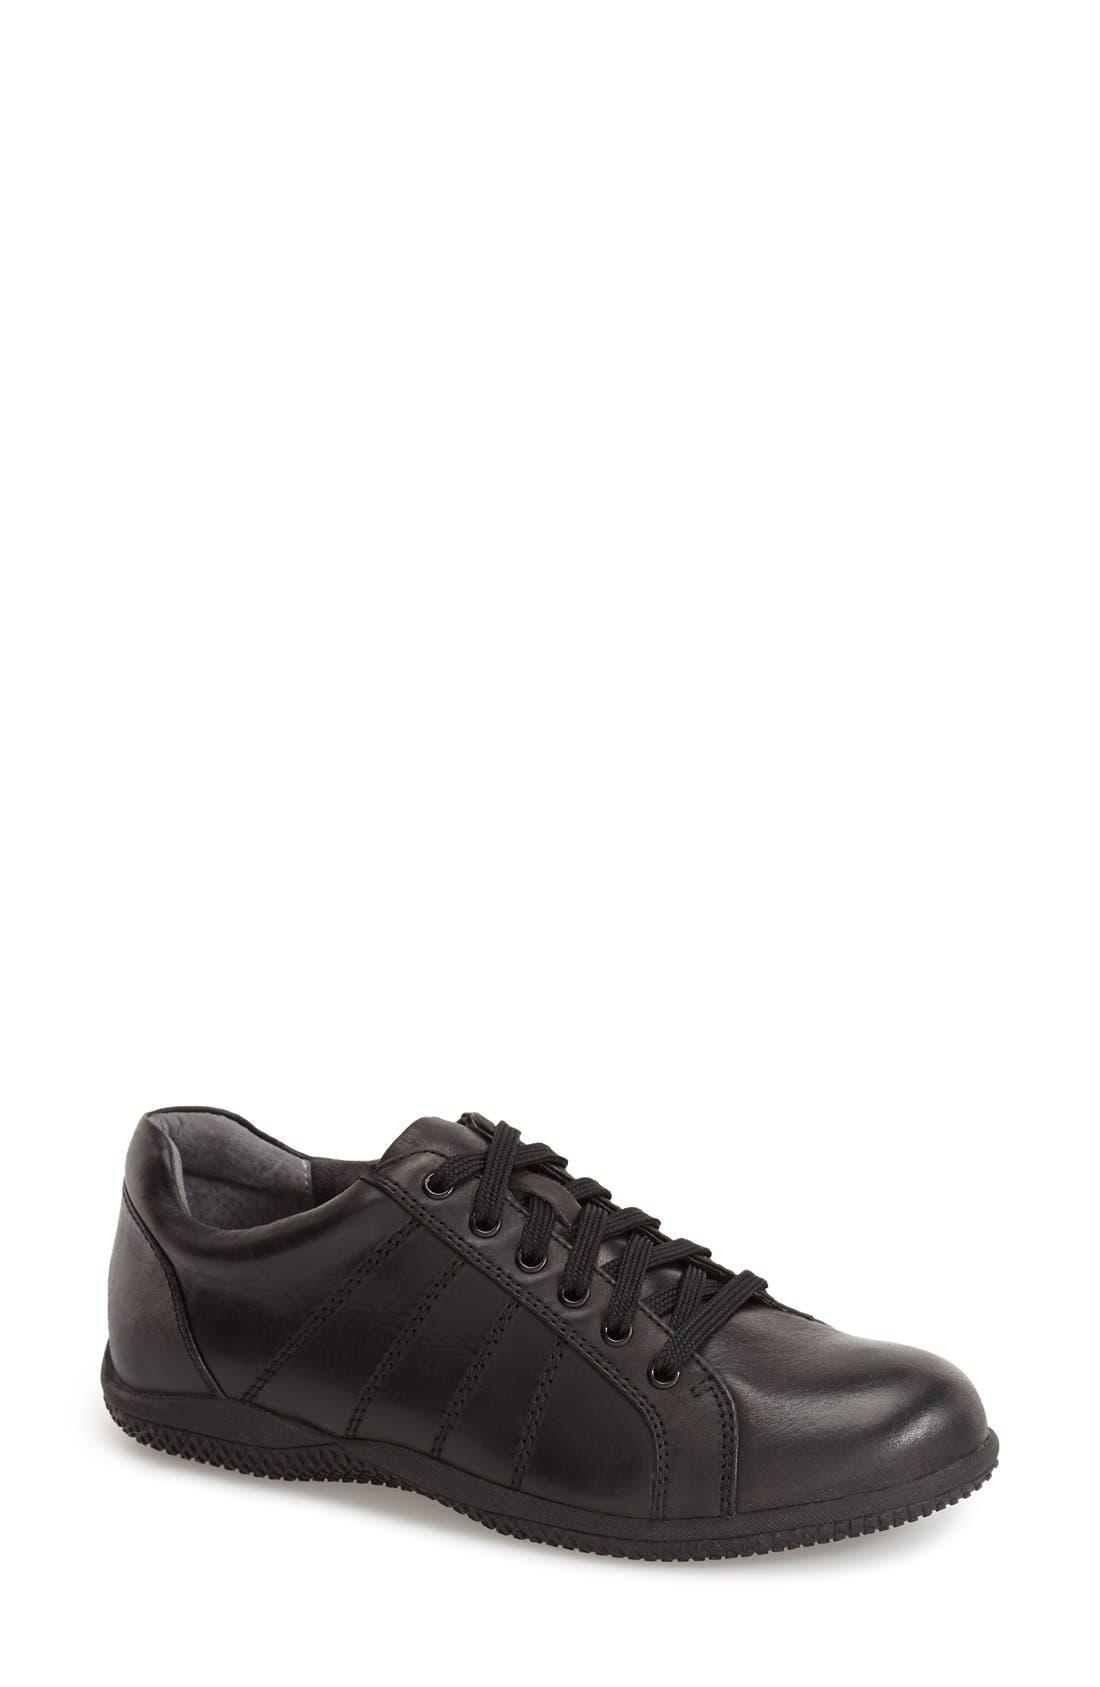 Main Image - SoftWalk® 'Hickory' Sneaker (Women)